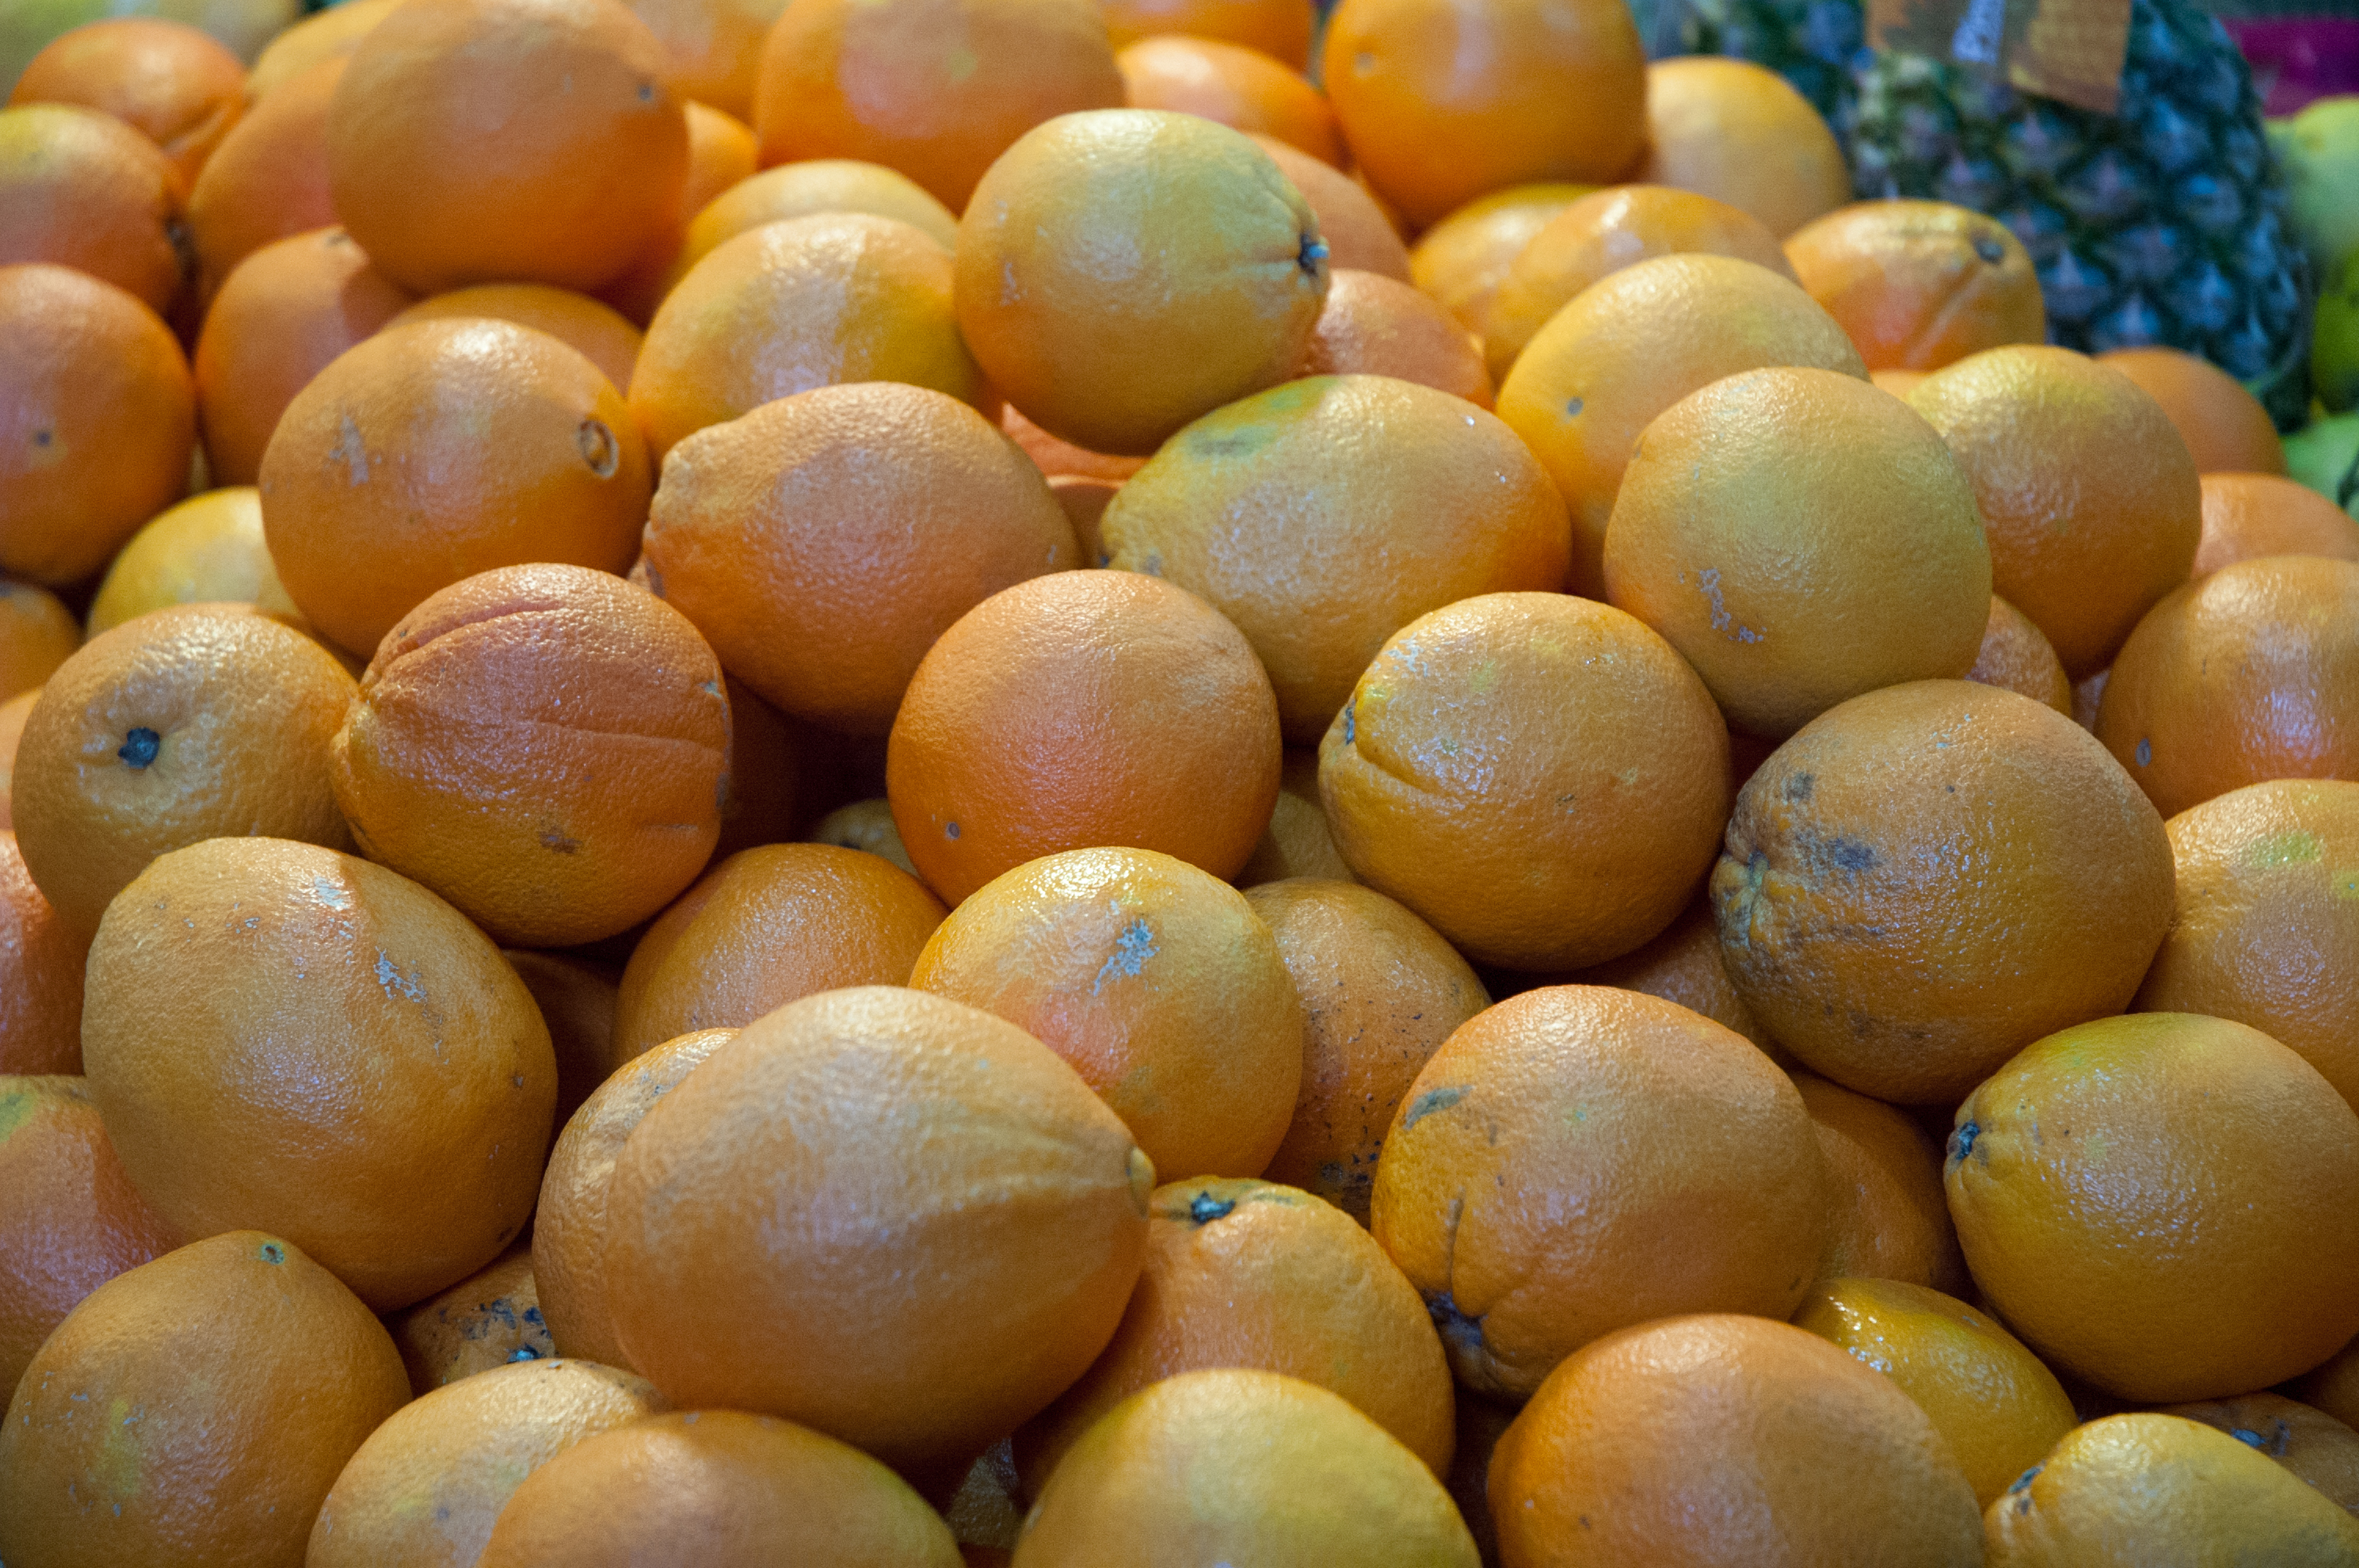 Pile of oranges   Free Stock Photo